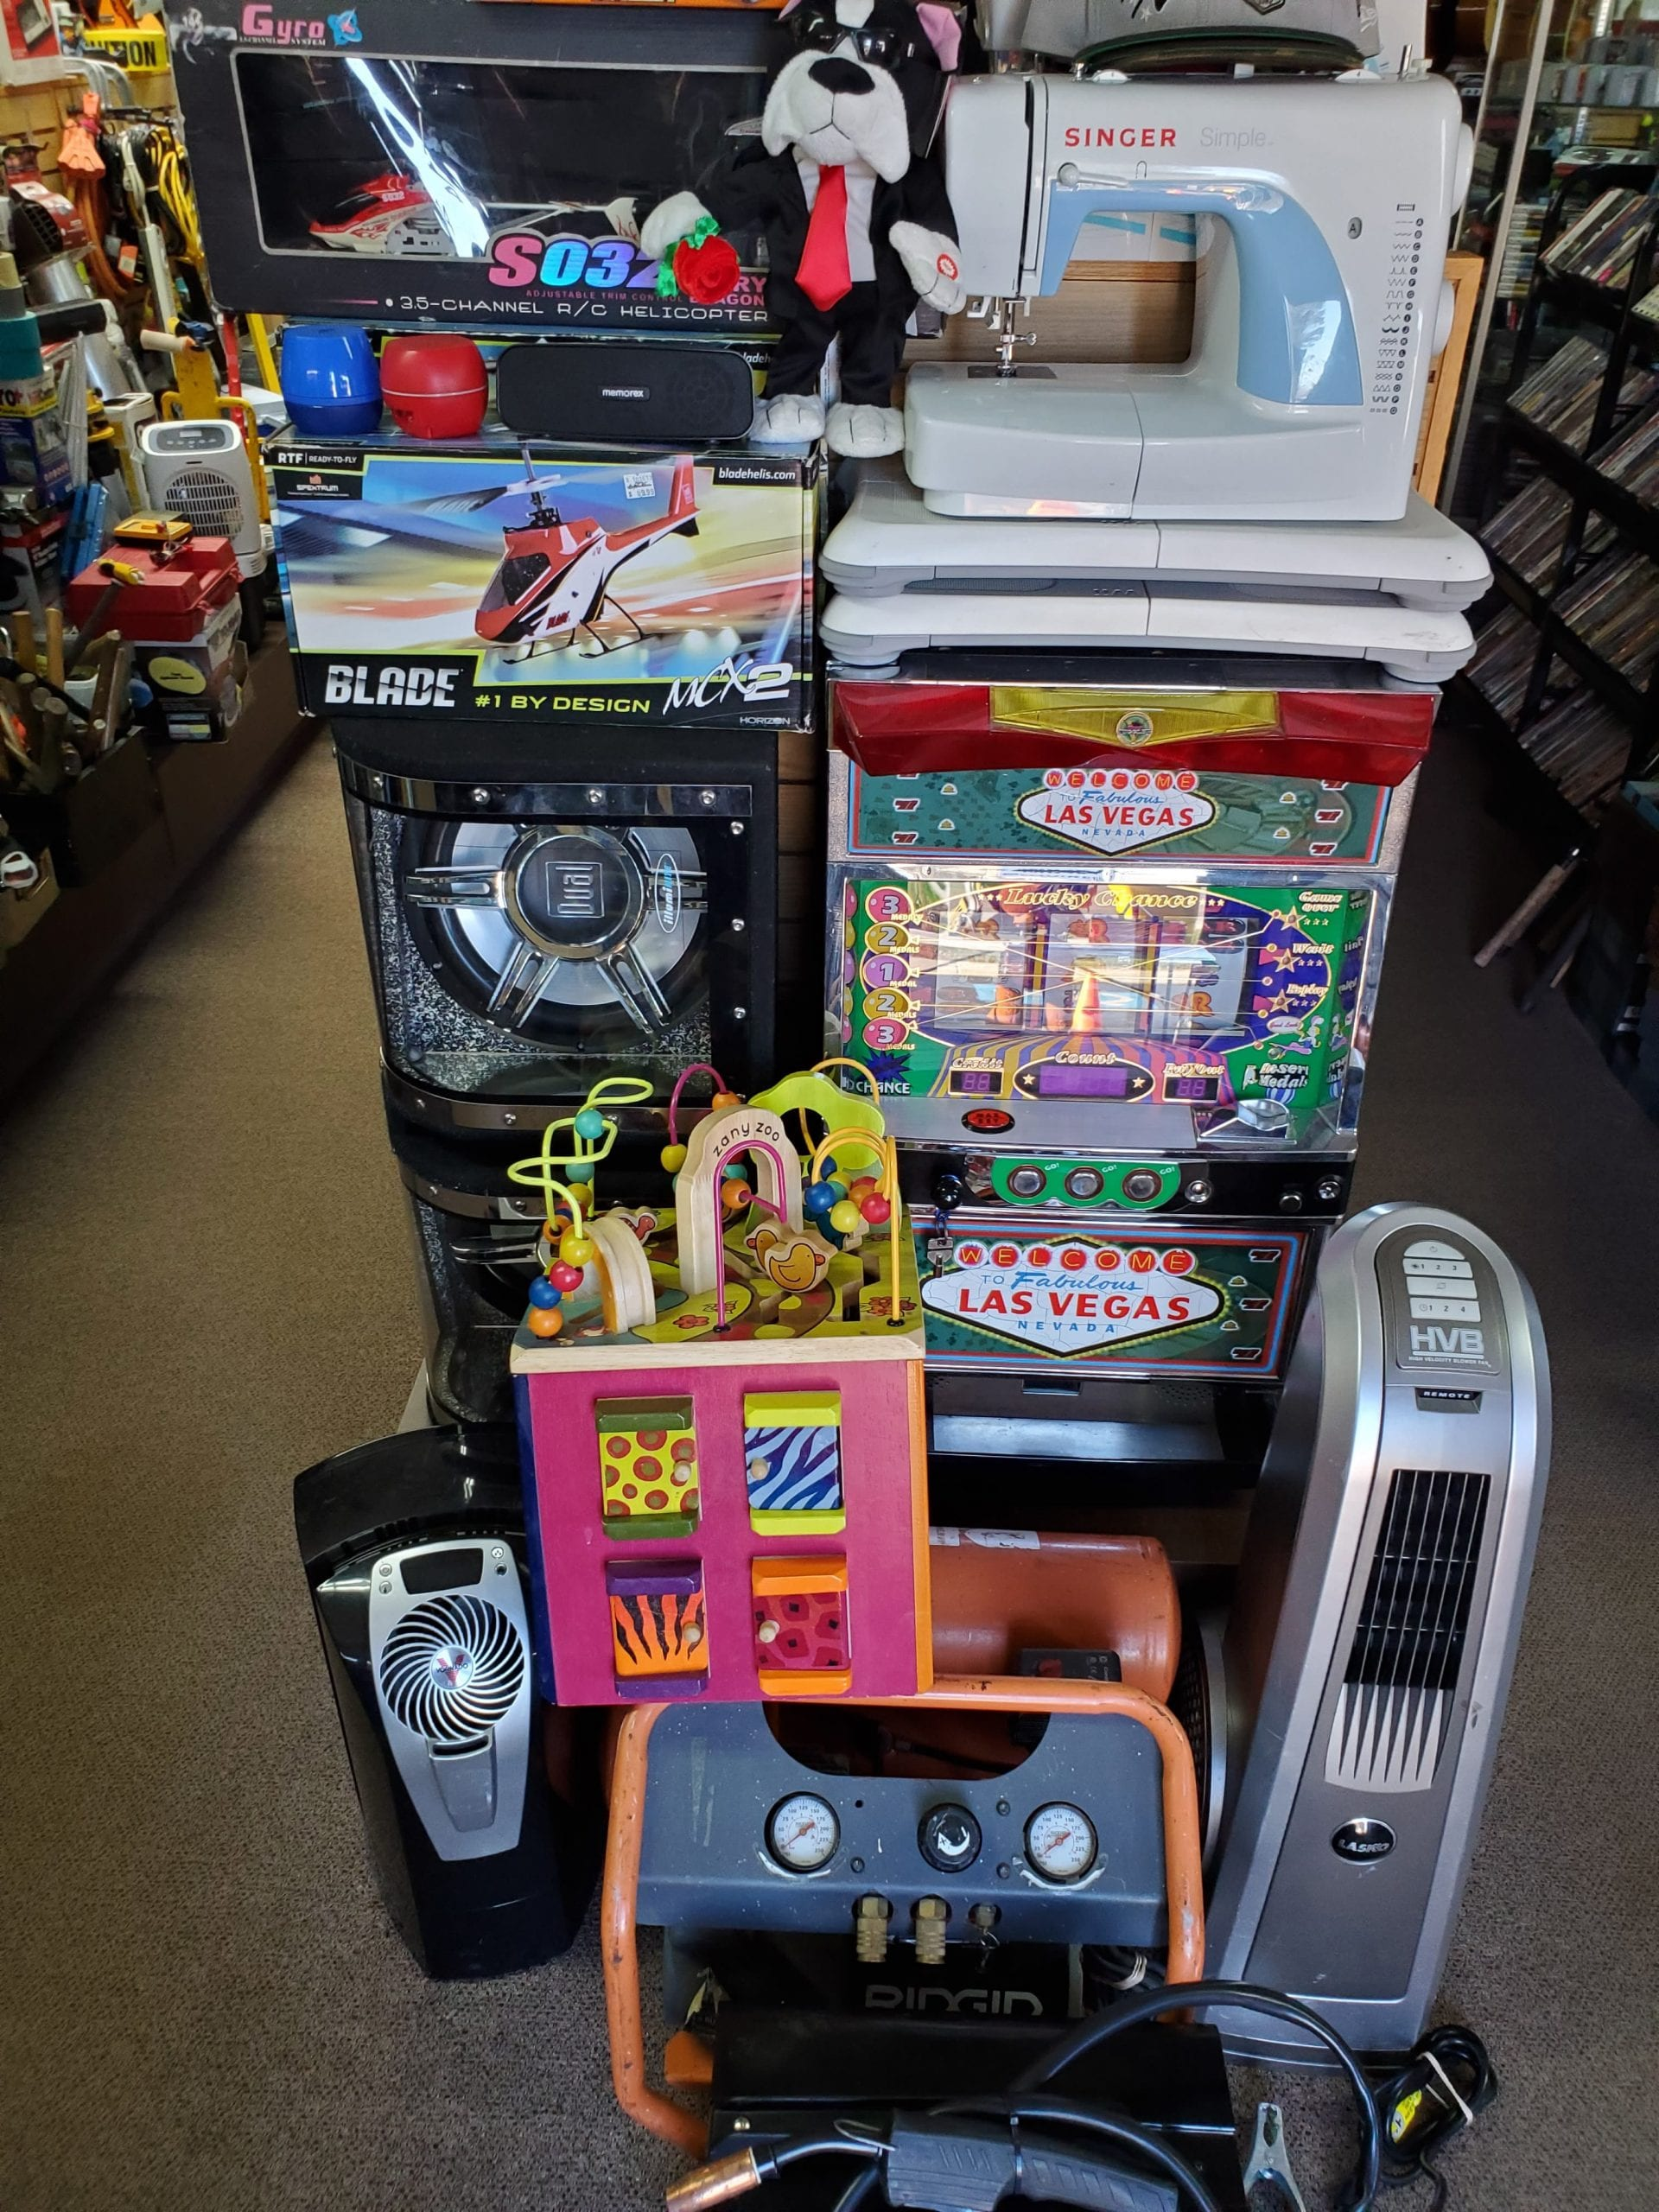 Slot-Machine-Air-Compressor-Subwoofer-Pawn-Roundlakebeach-Traderjons